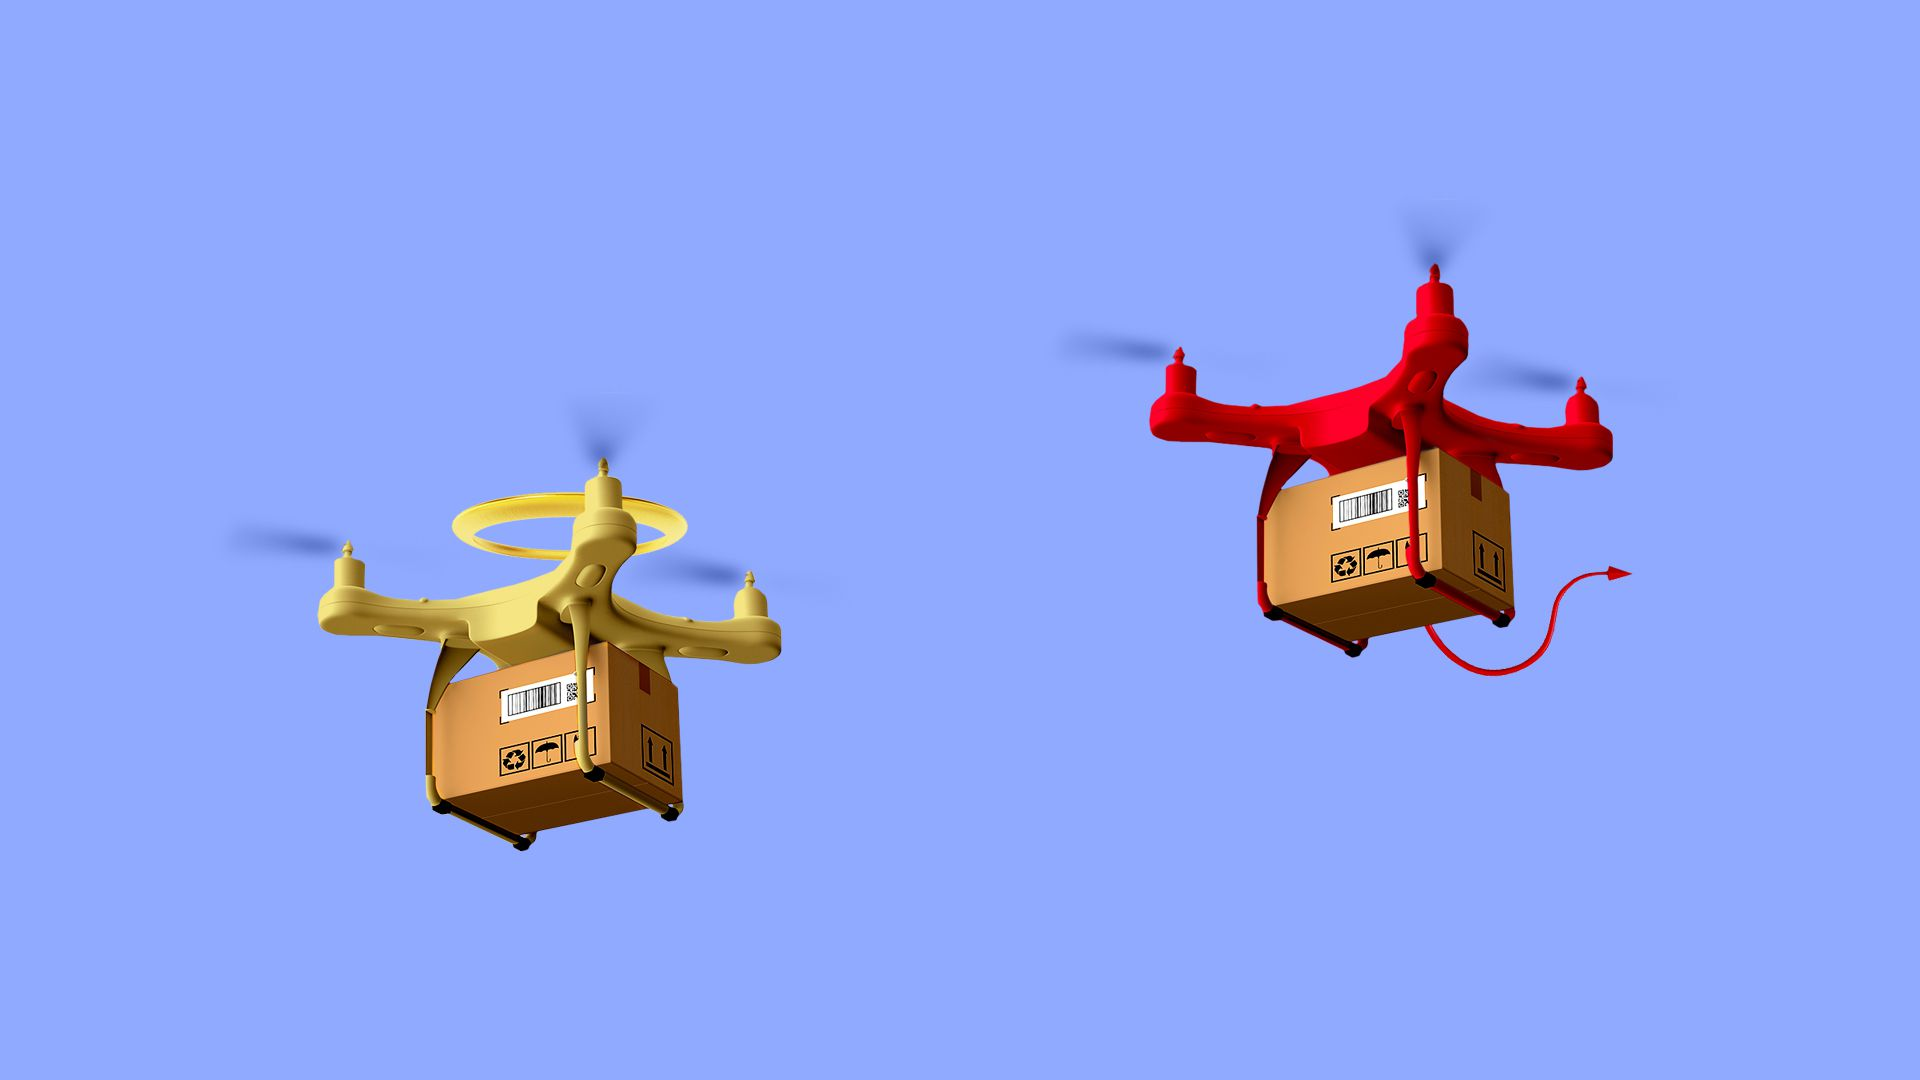 Illustration of angel and devil delivery drones